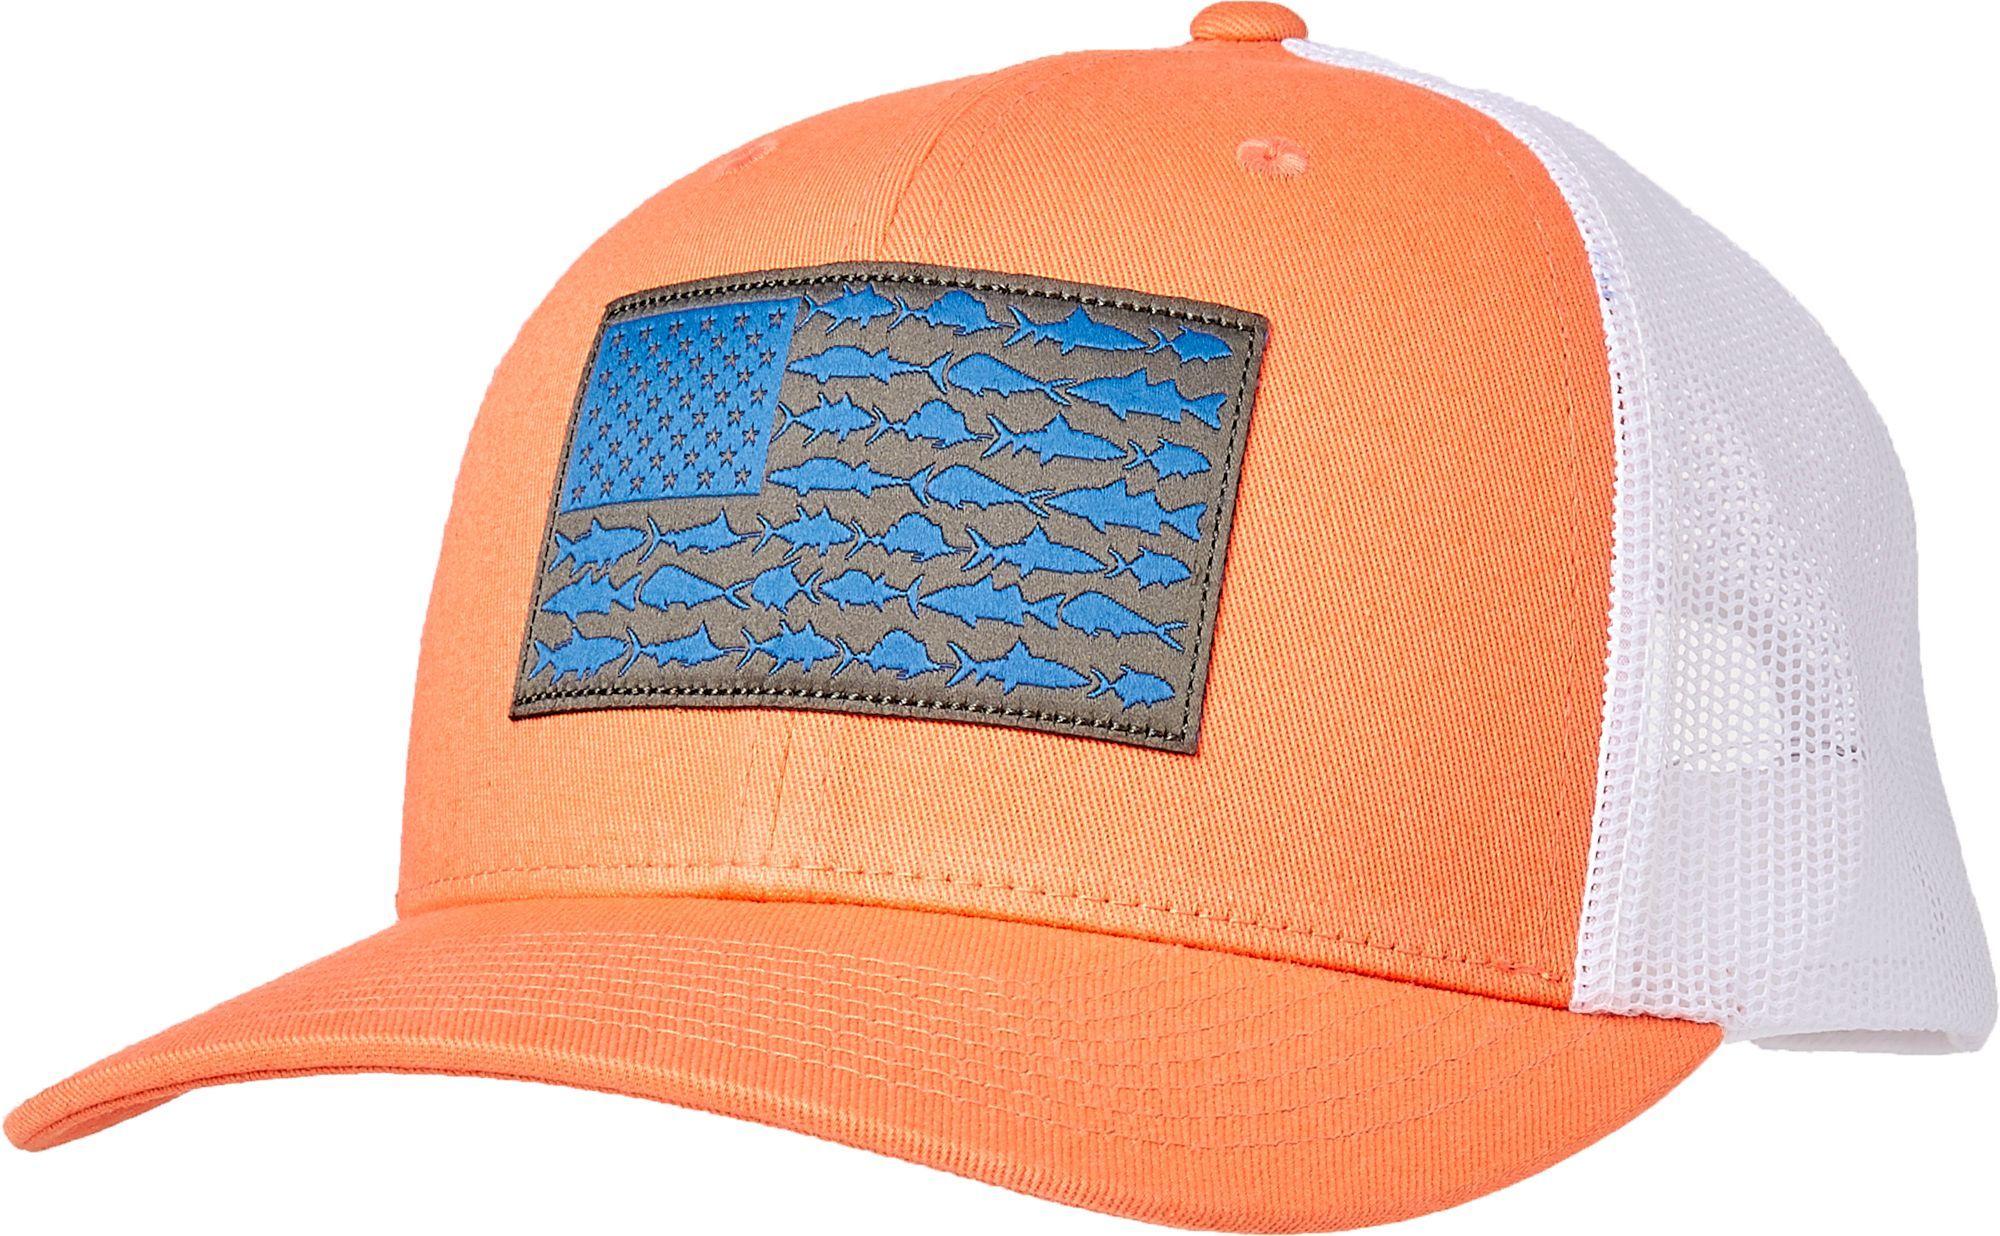 579494790497b3 Columbia Men's PFG Mesh Snap Back Cap, Bright Peach/Vivid Blue Fish Flag